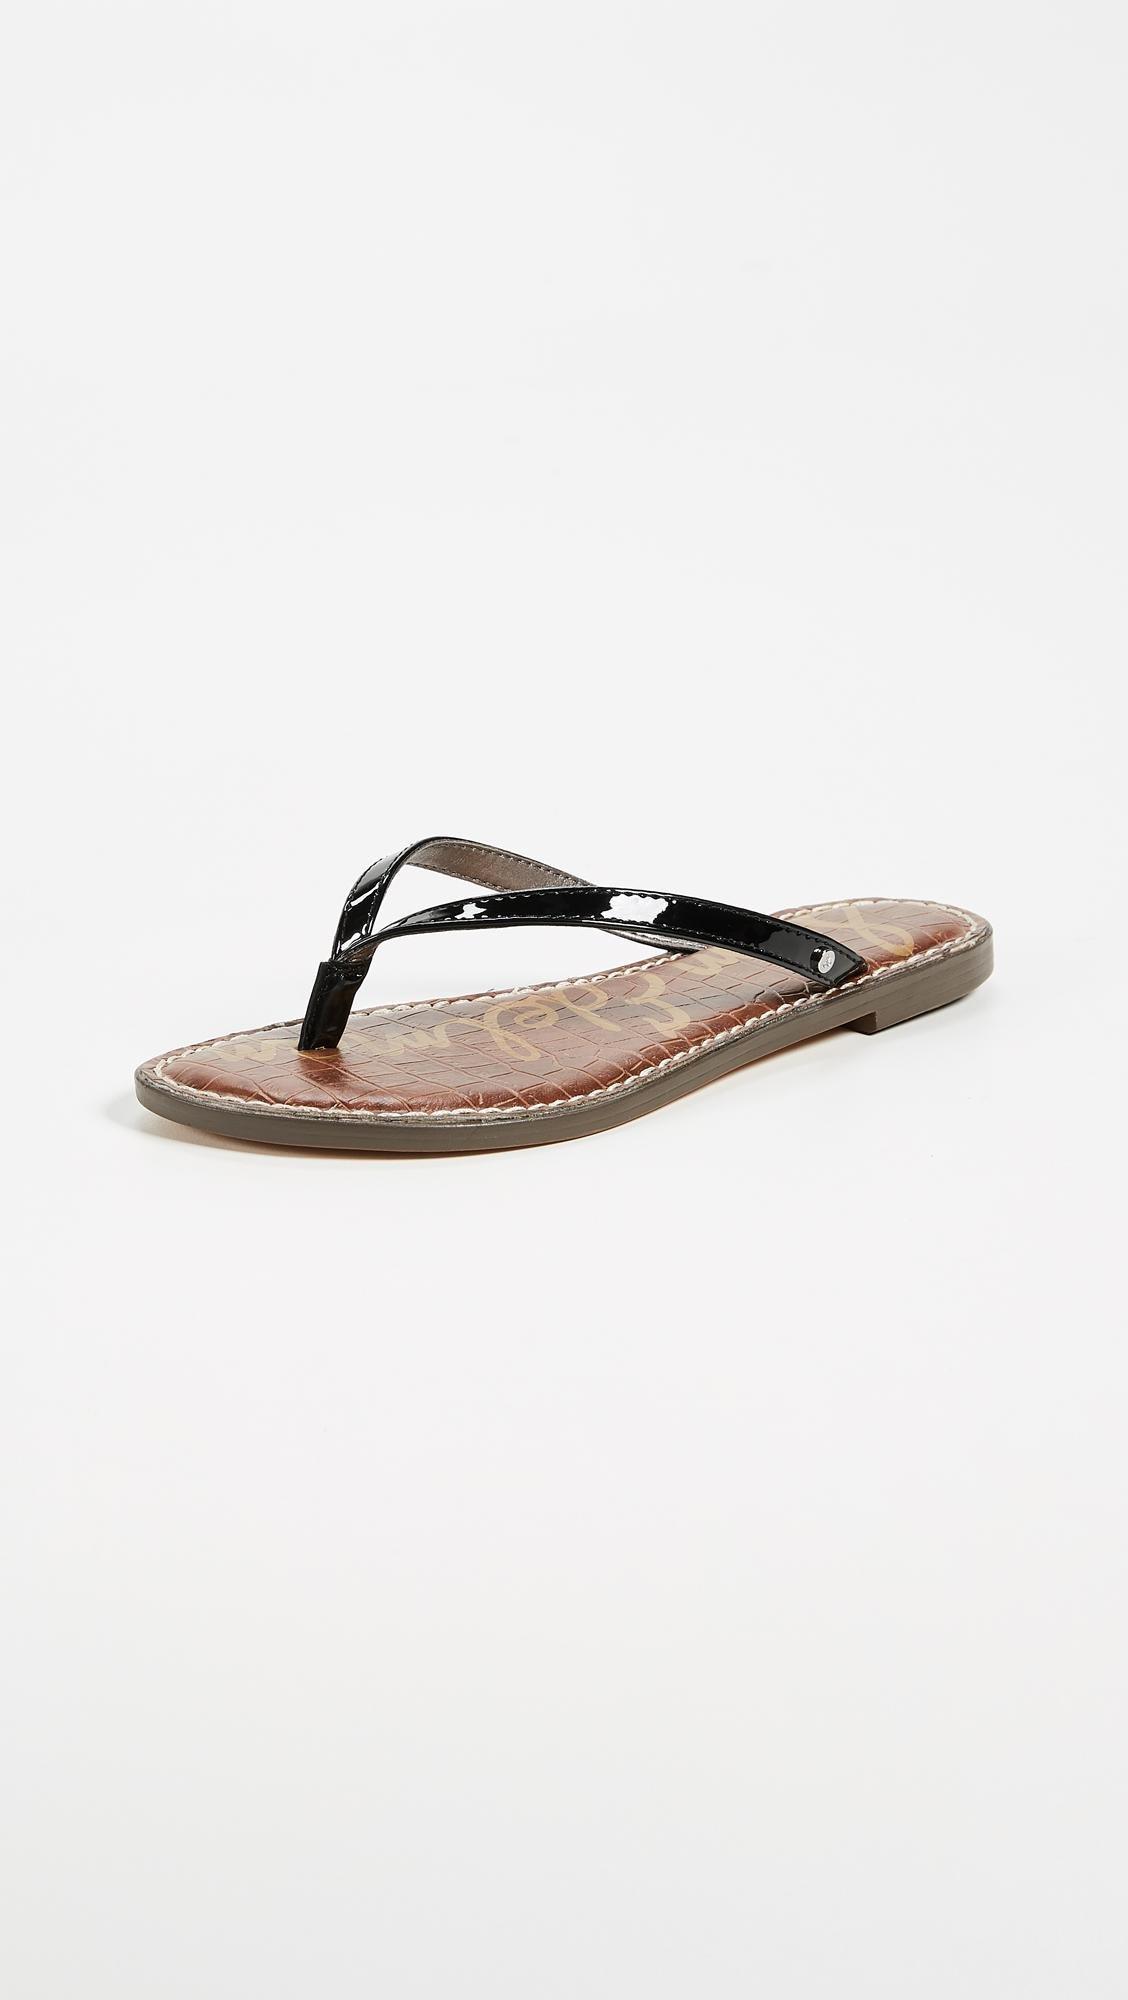 296bf261d730b Lyst - Sam Edelman Gracie Thong Sandals in Black